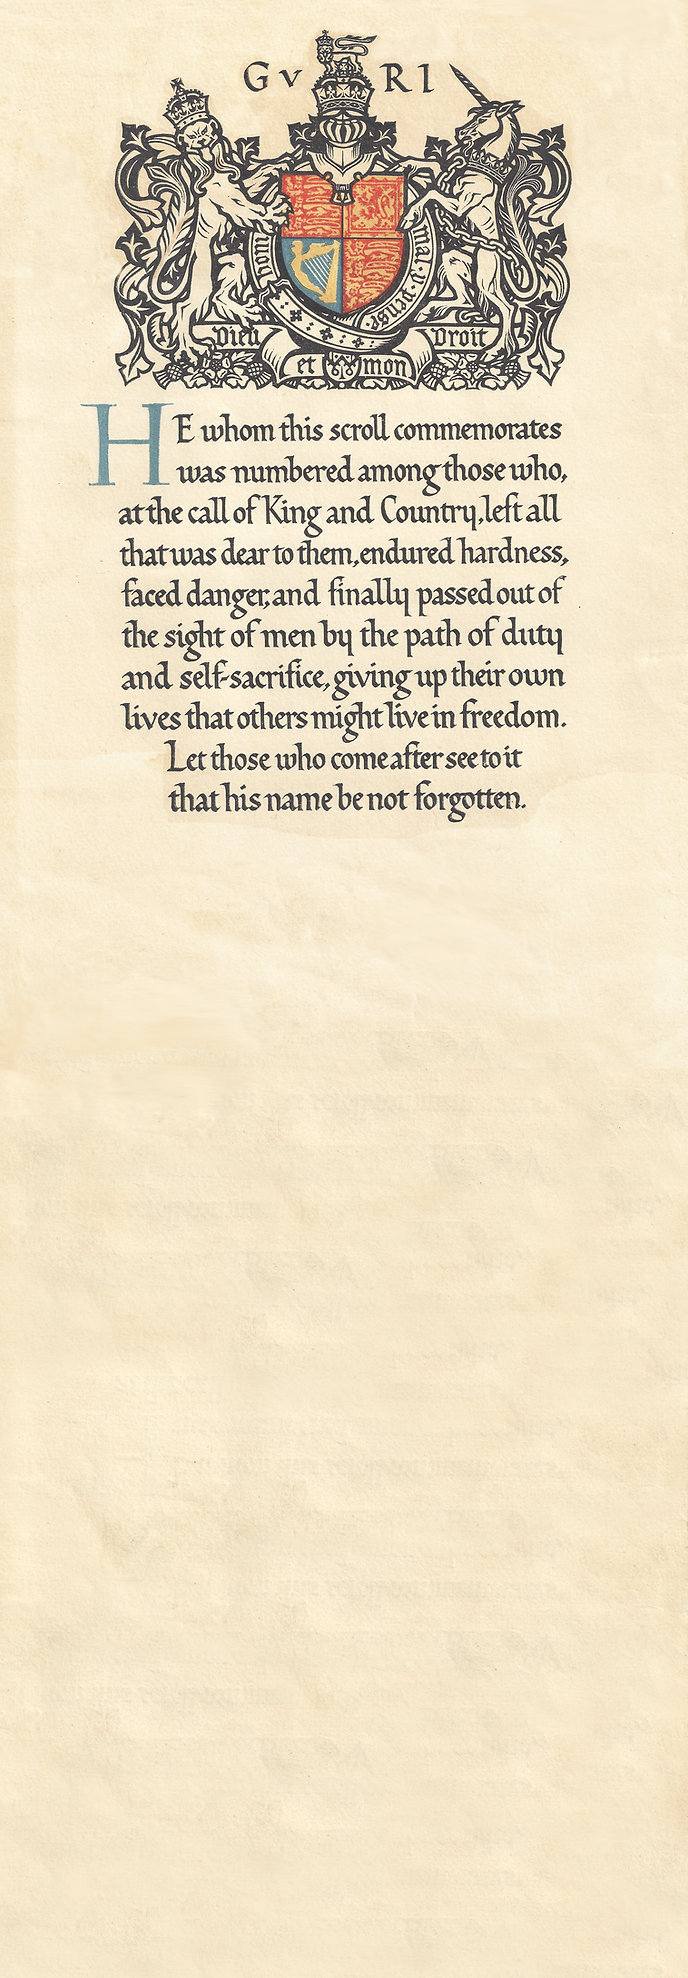 Scroll from King George V - Edited.jpg